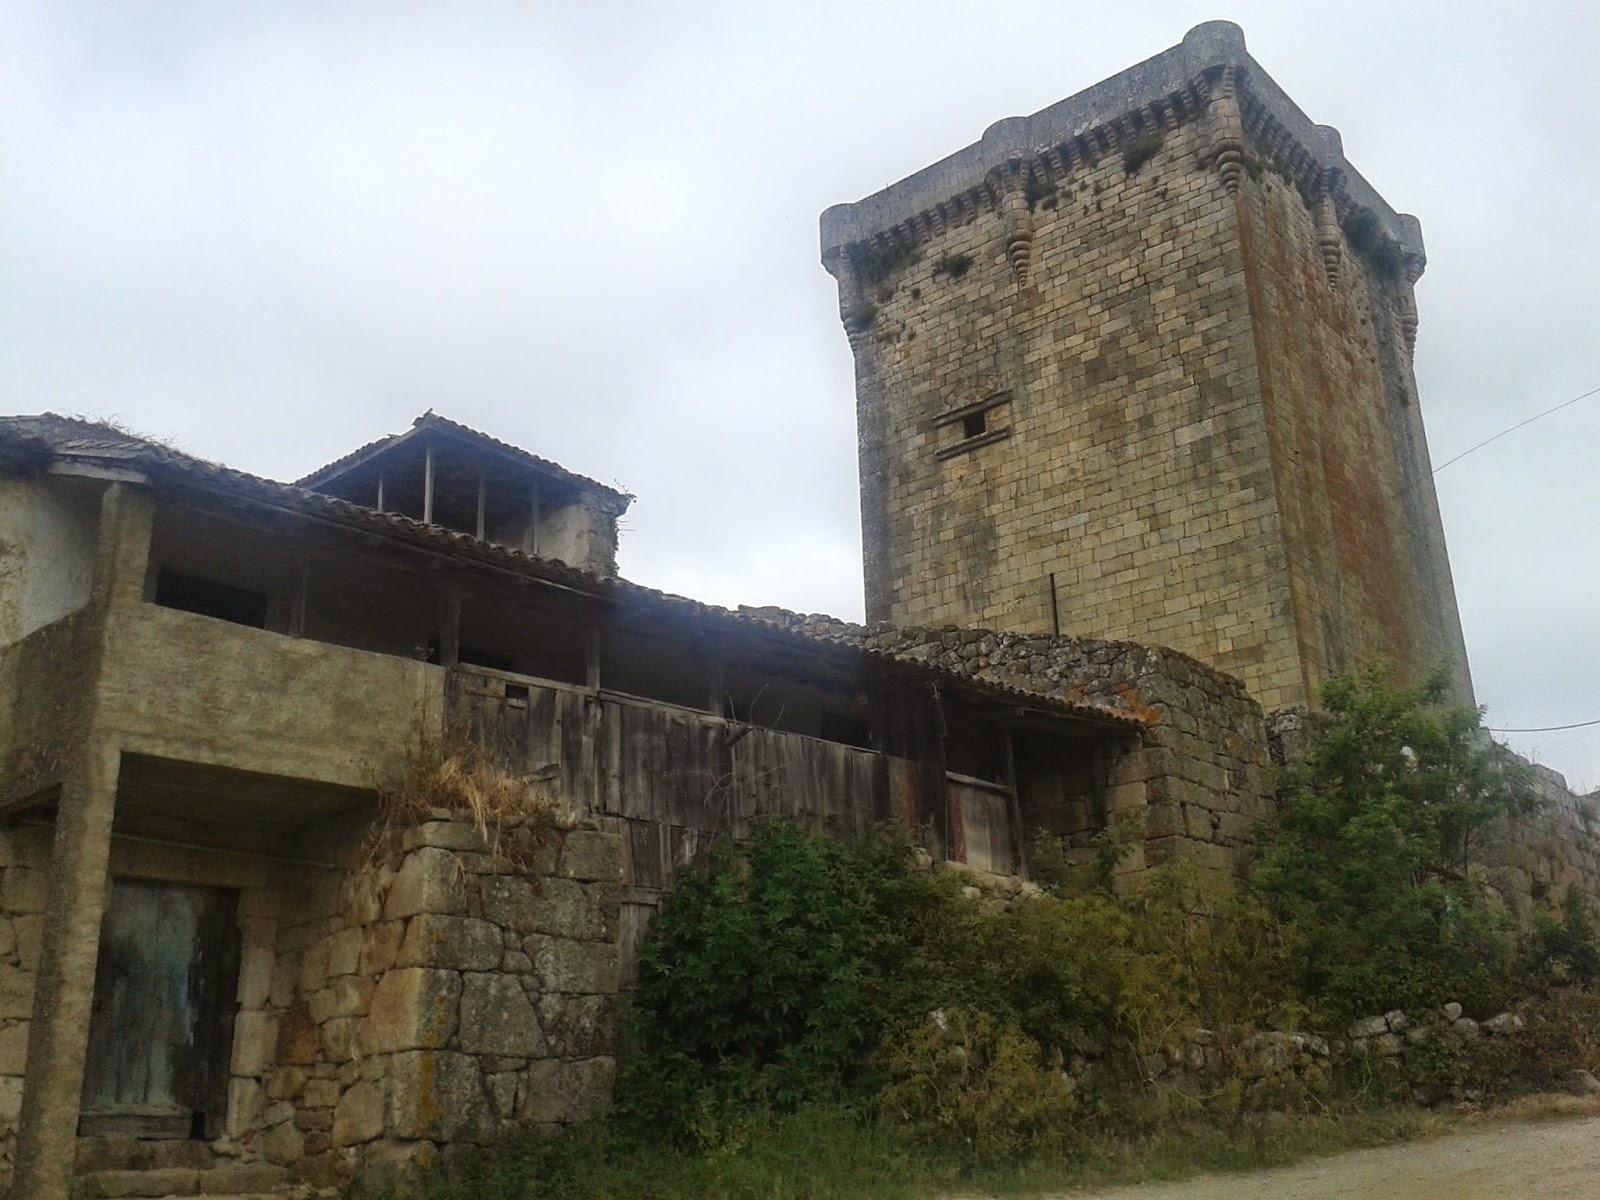 Castillo de Monterrei Torre del Homenaje